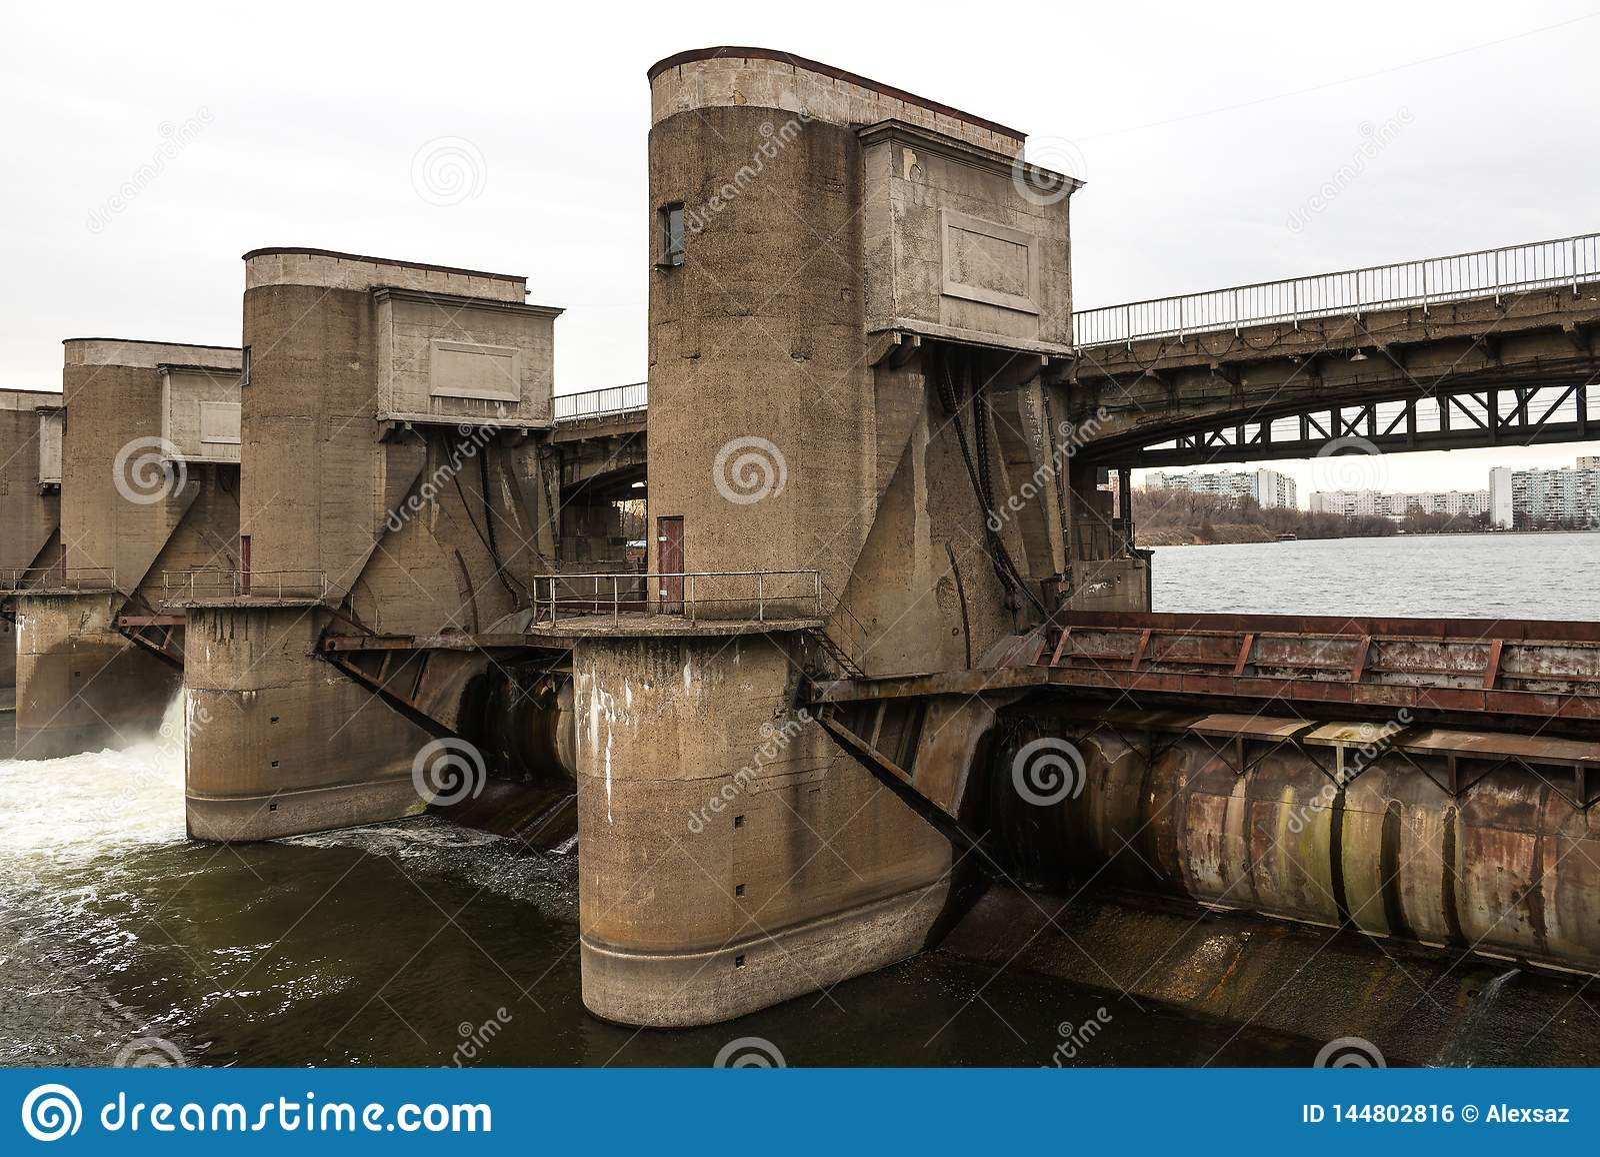 Descarga da água durante o snowmelt da mola na represa de Perervinsk instalada no rio de Moscou, para manter o nível de água a